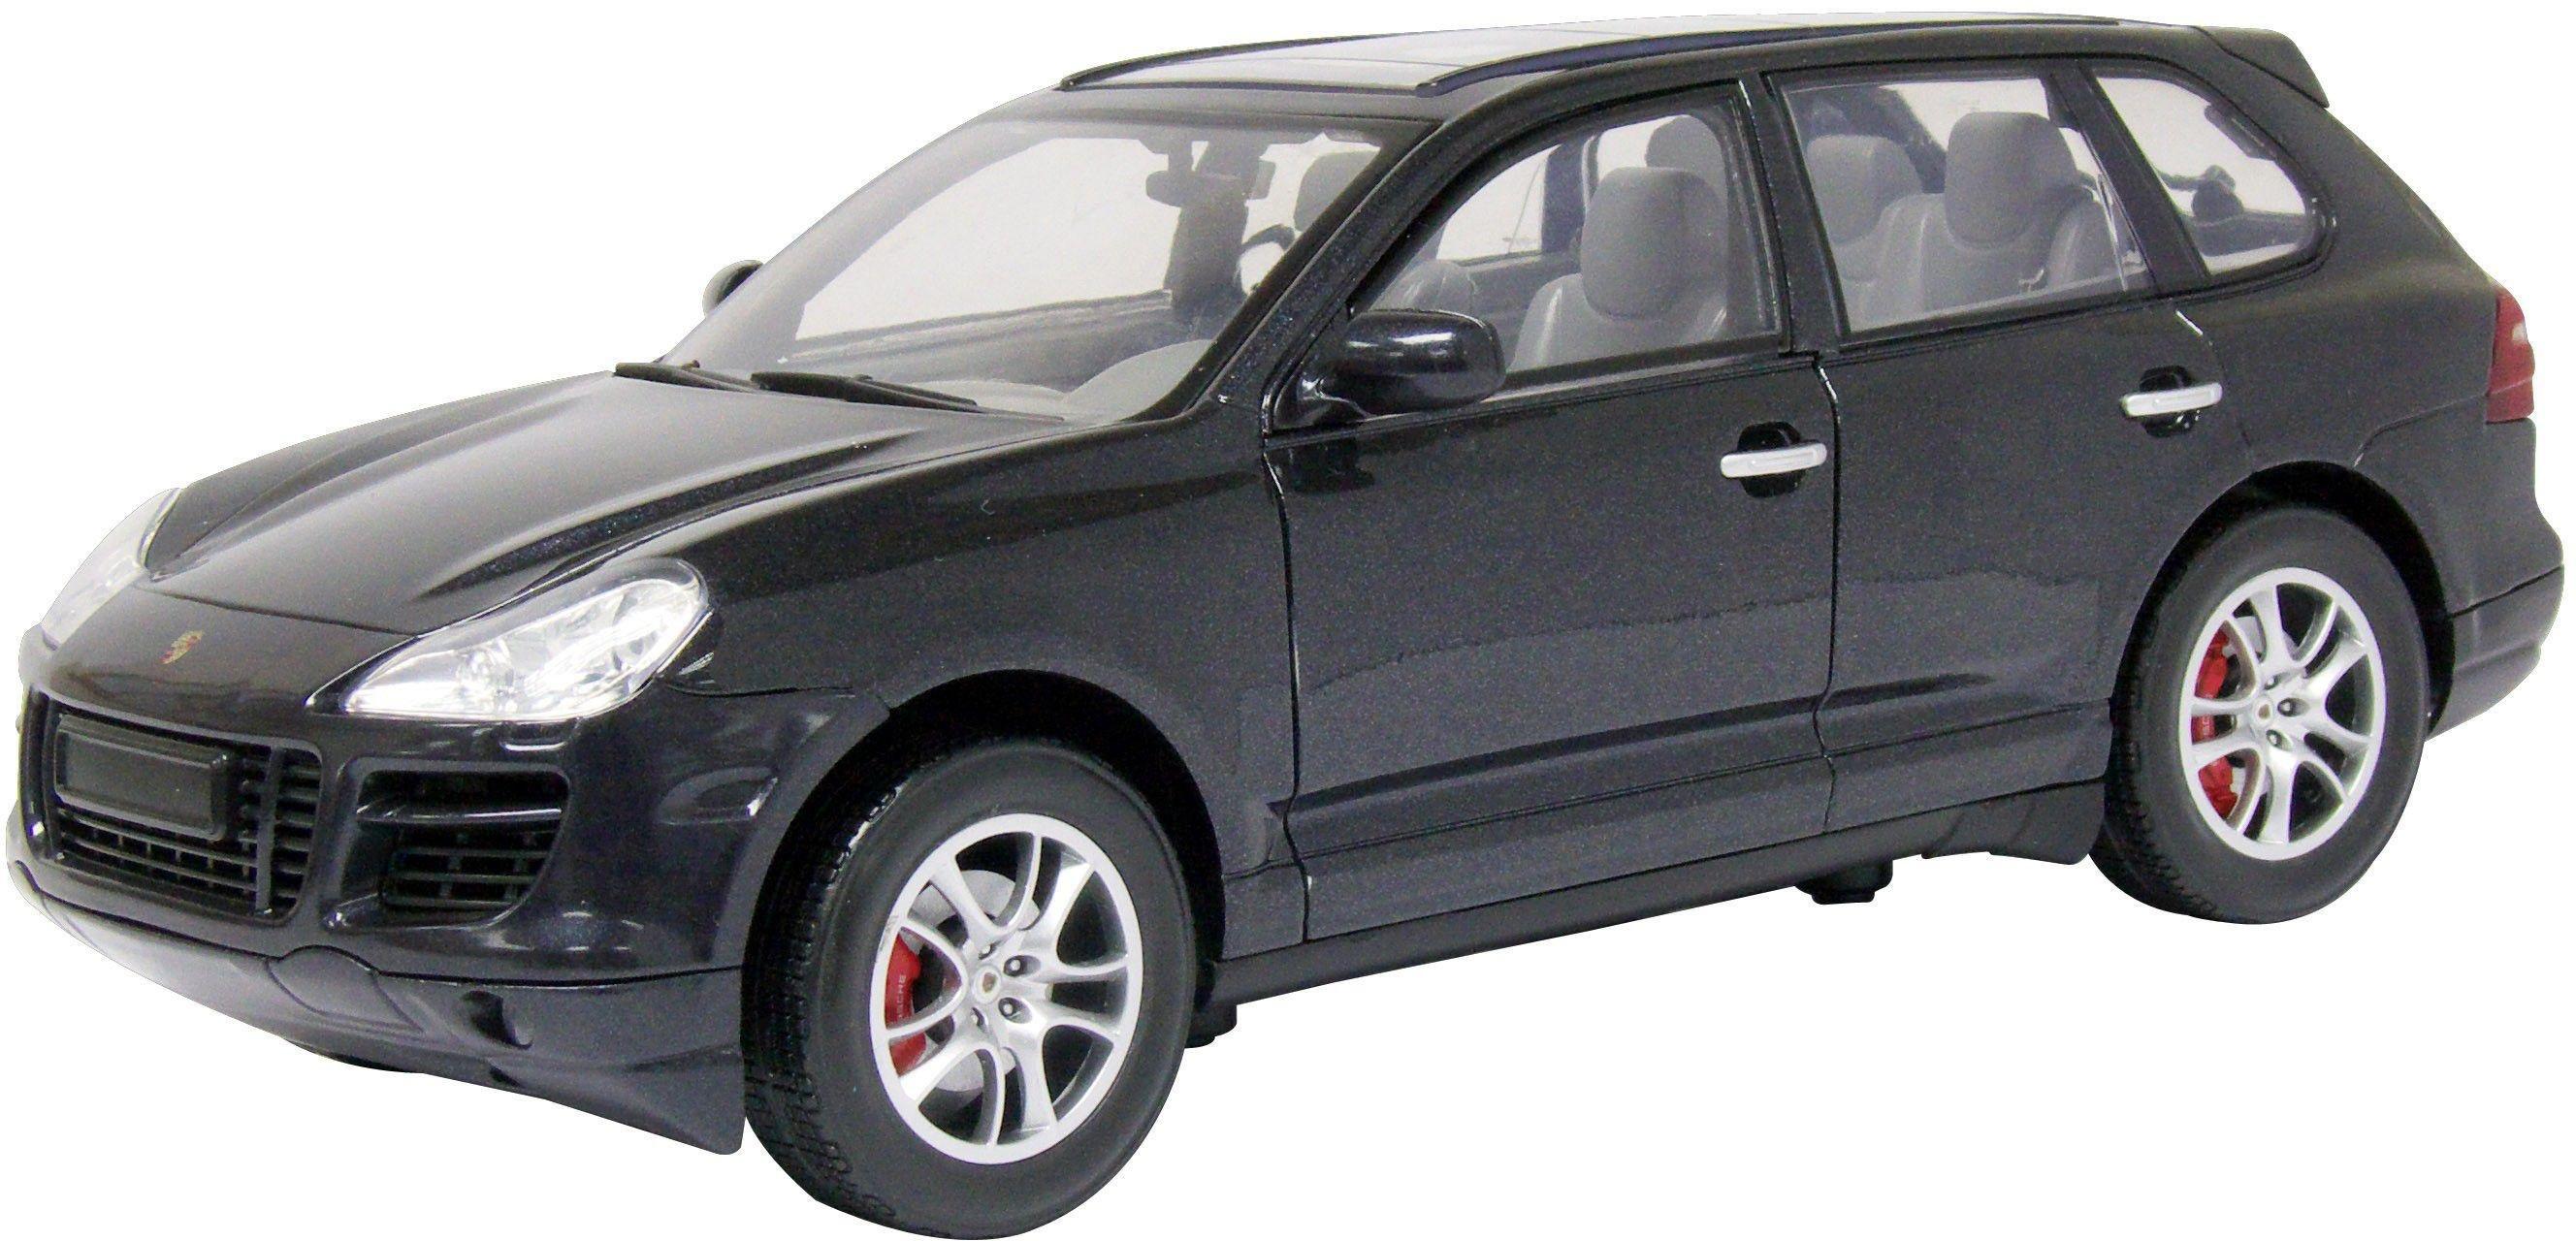 Porsche - Cayenne Turbo Black Diecast-  Collectors Model.